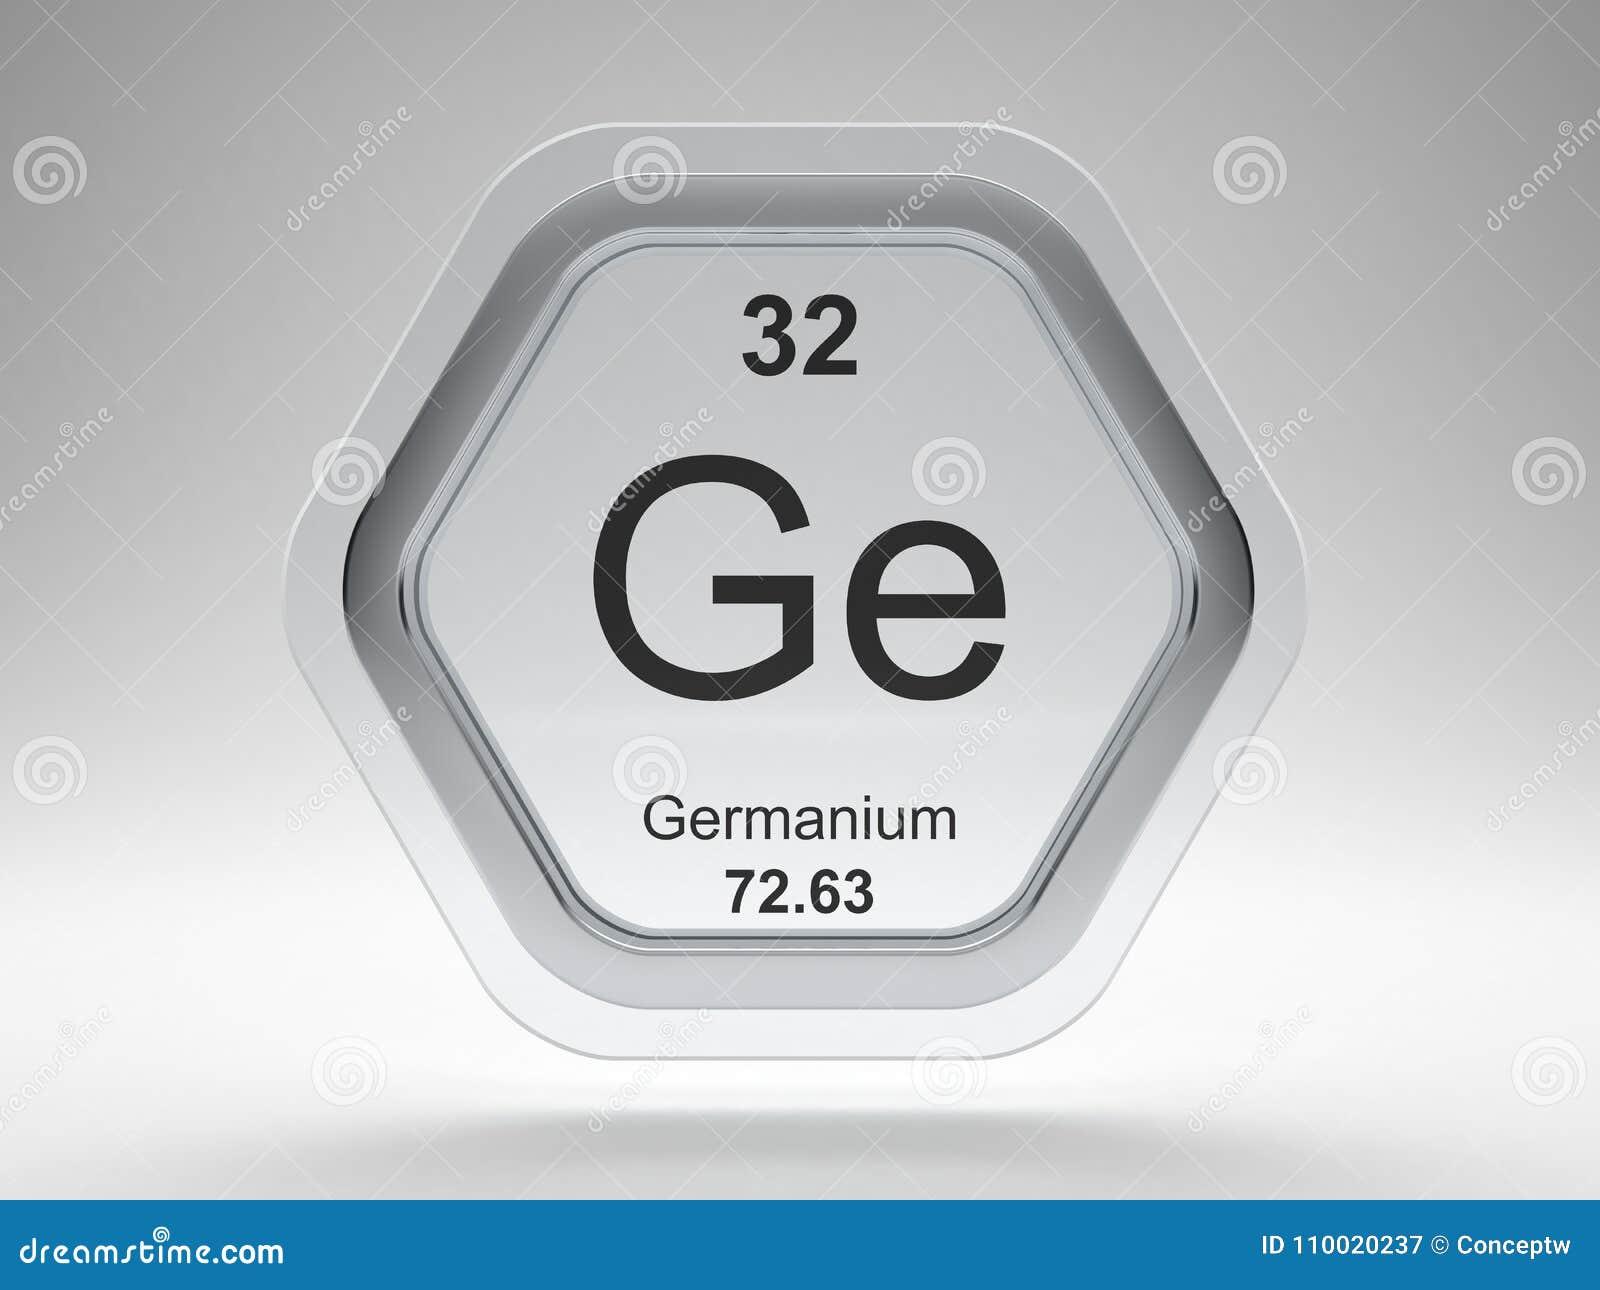 Germanium Symbol Hexagon Frame Stock Illustration Illustration Of